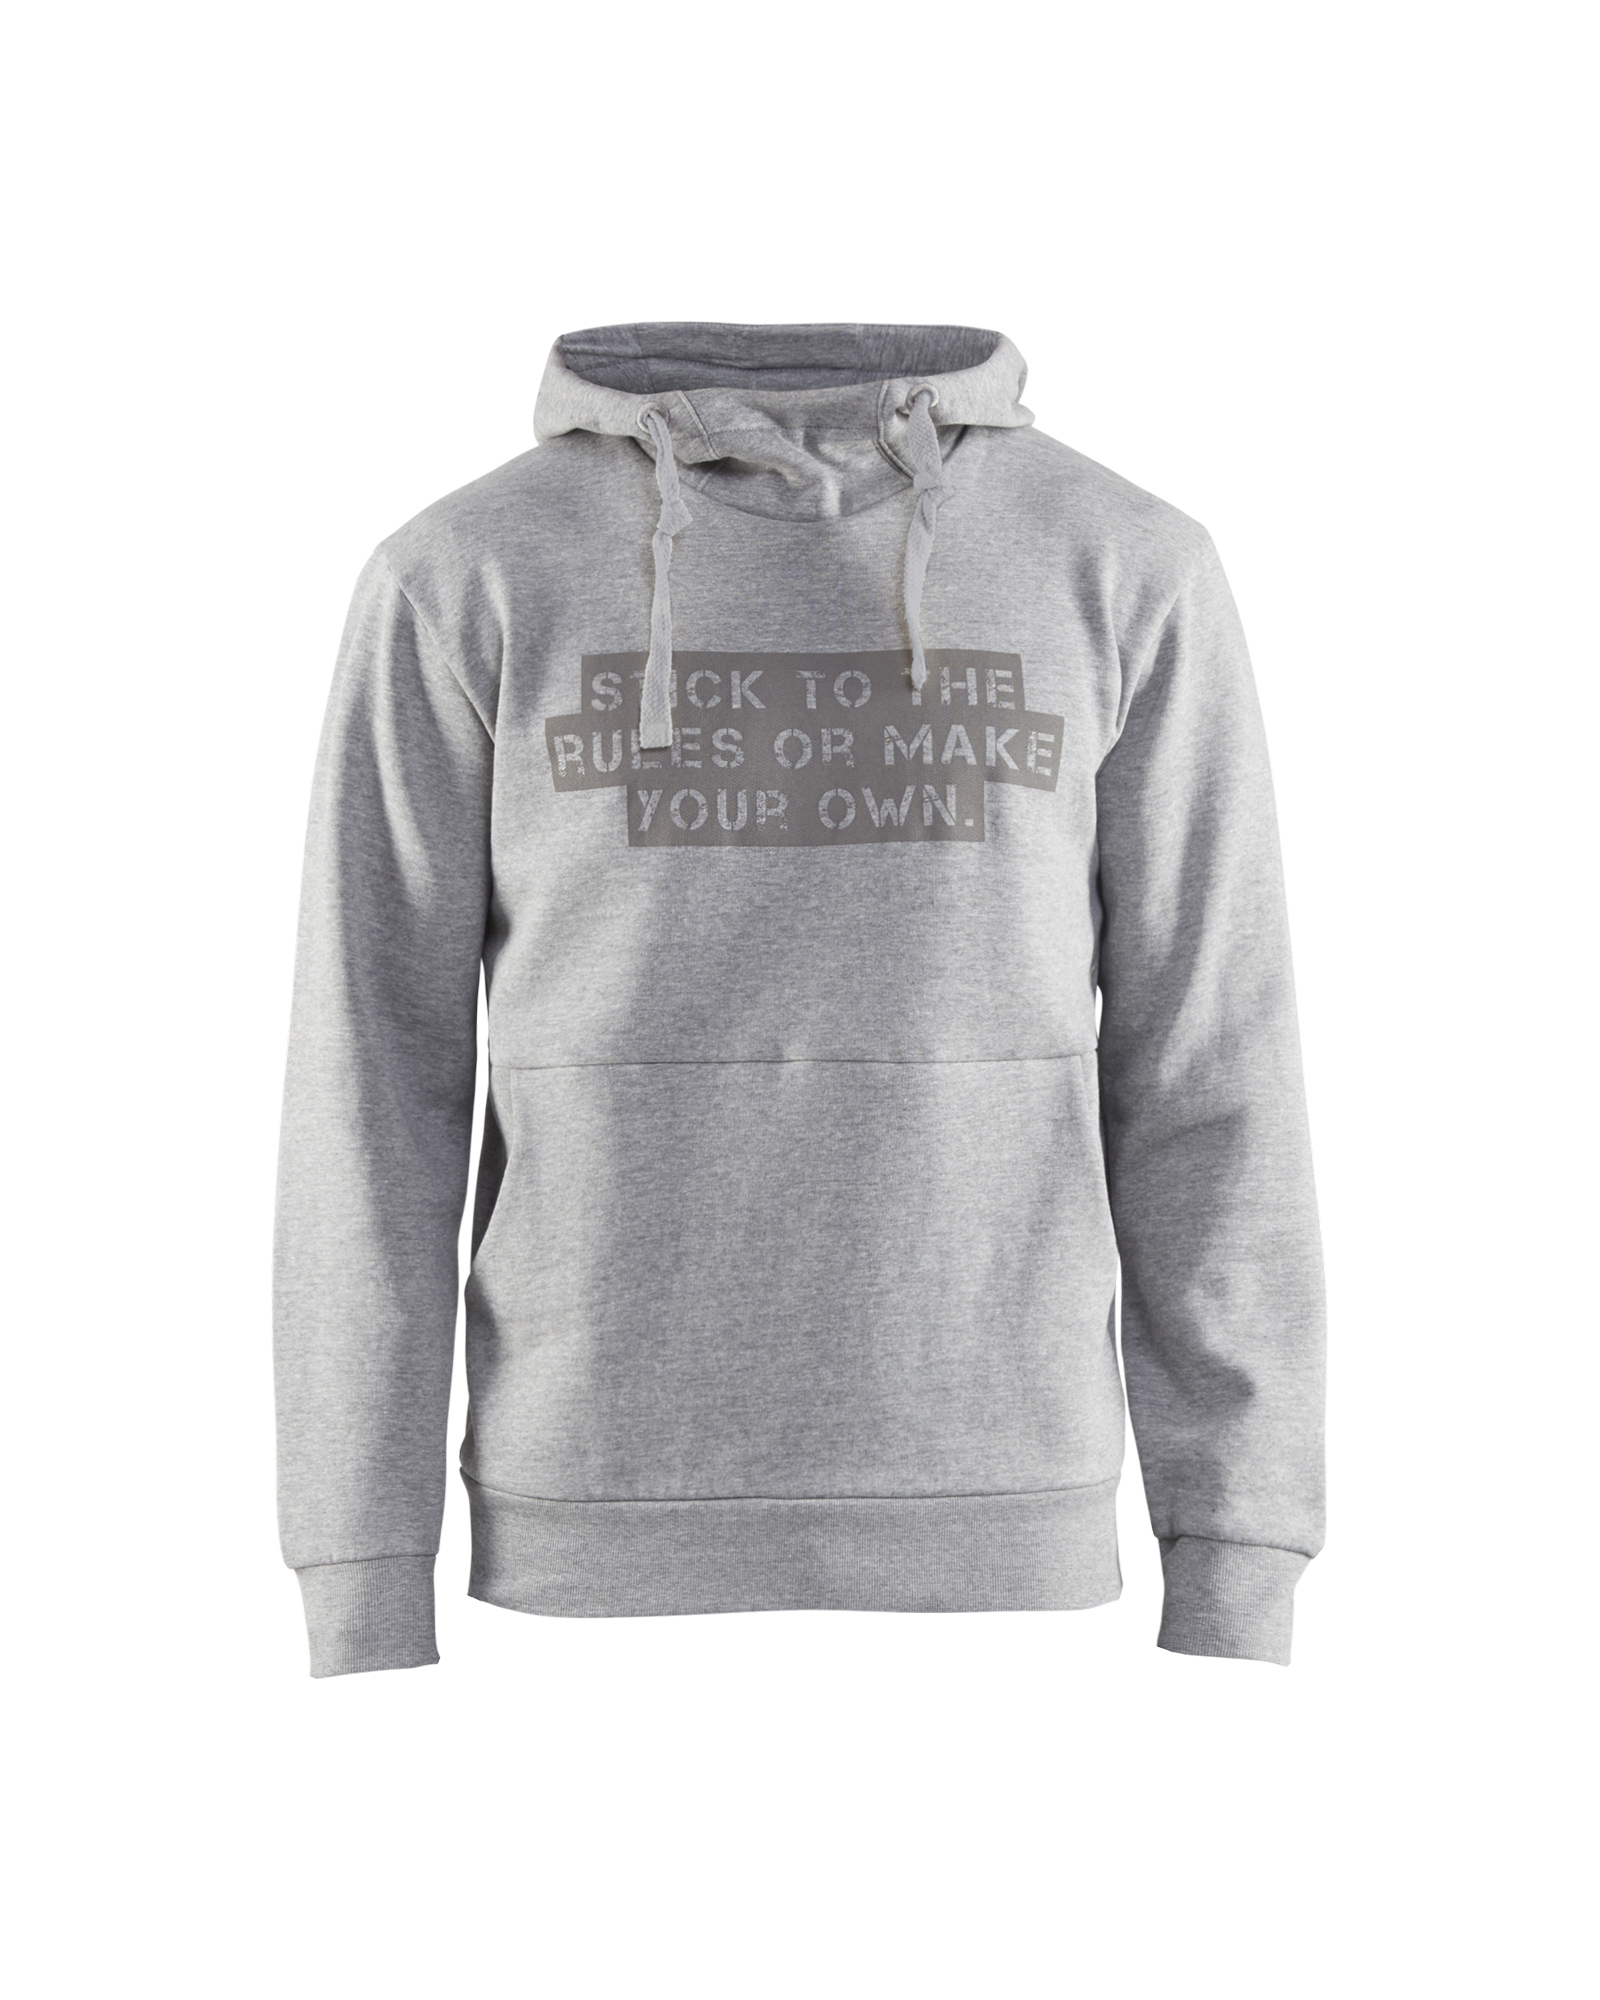 Hooded sweatshirt Limited